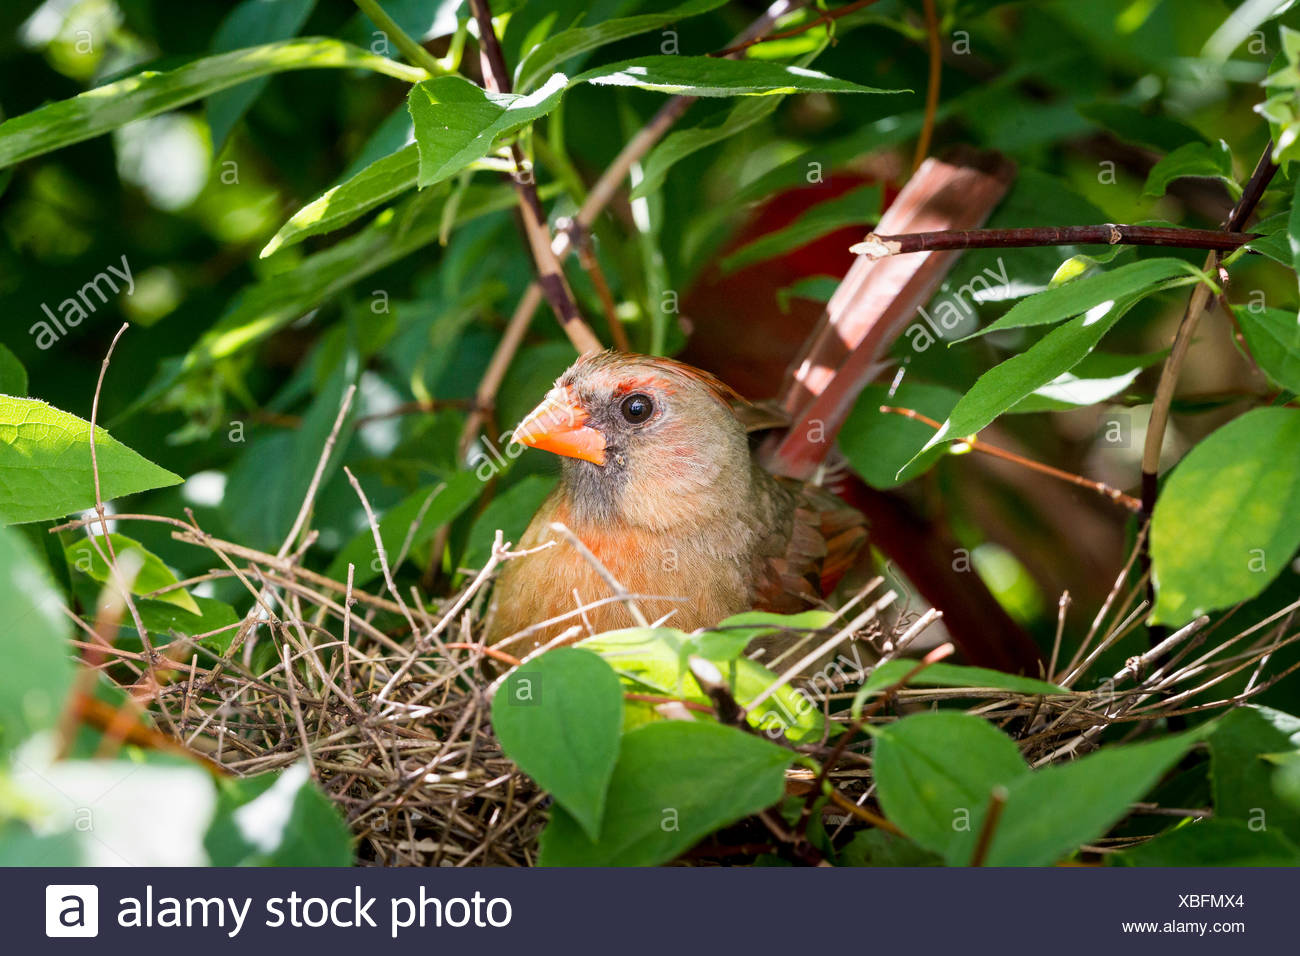 Female Northern Cardinal (Cardinalis cardinalis) at nest, Toronto, Ontario Stock Photo